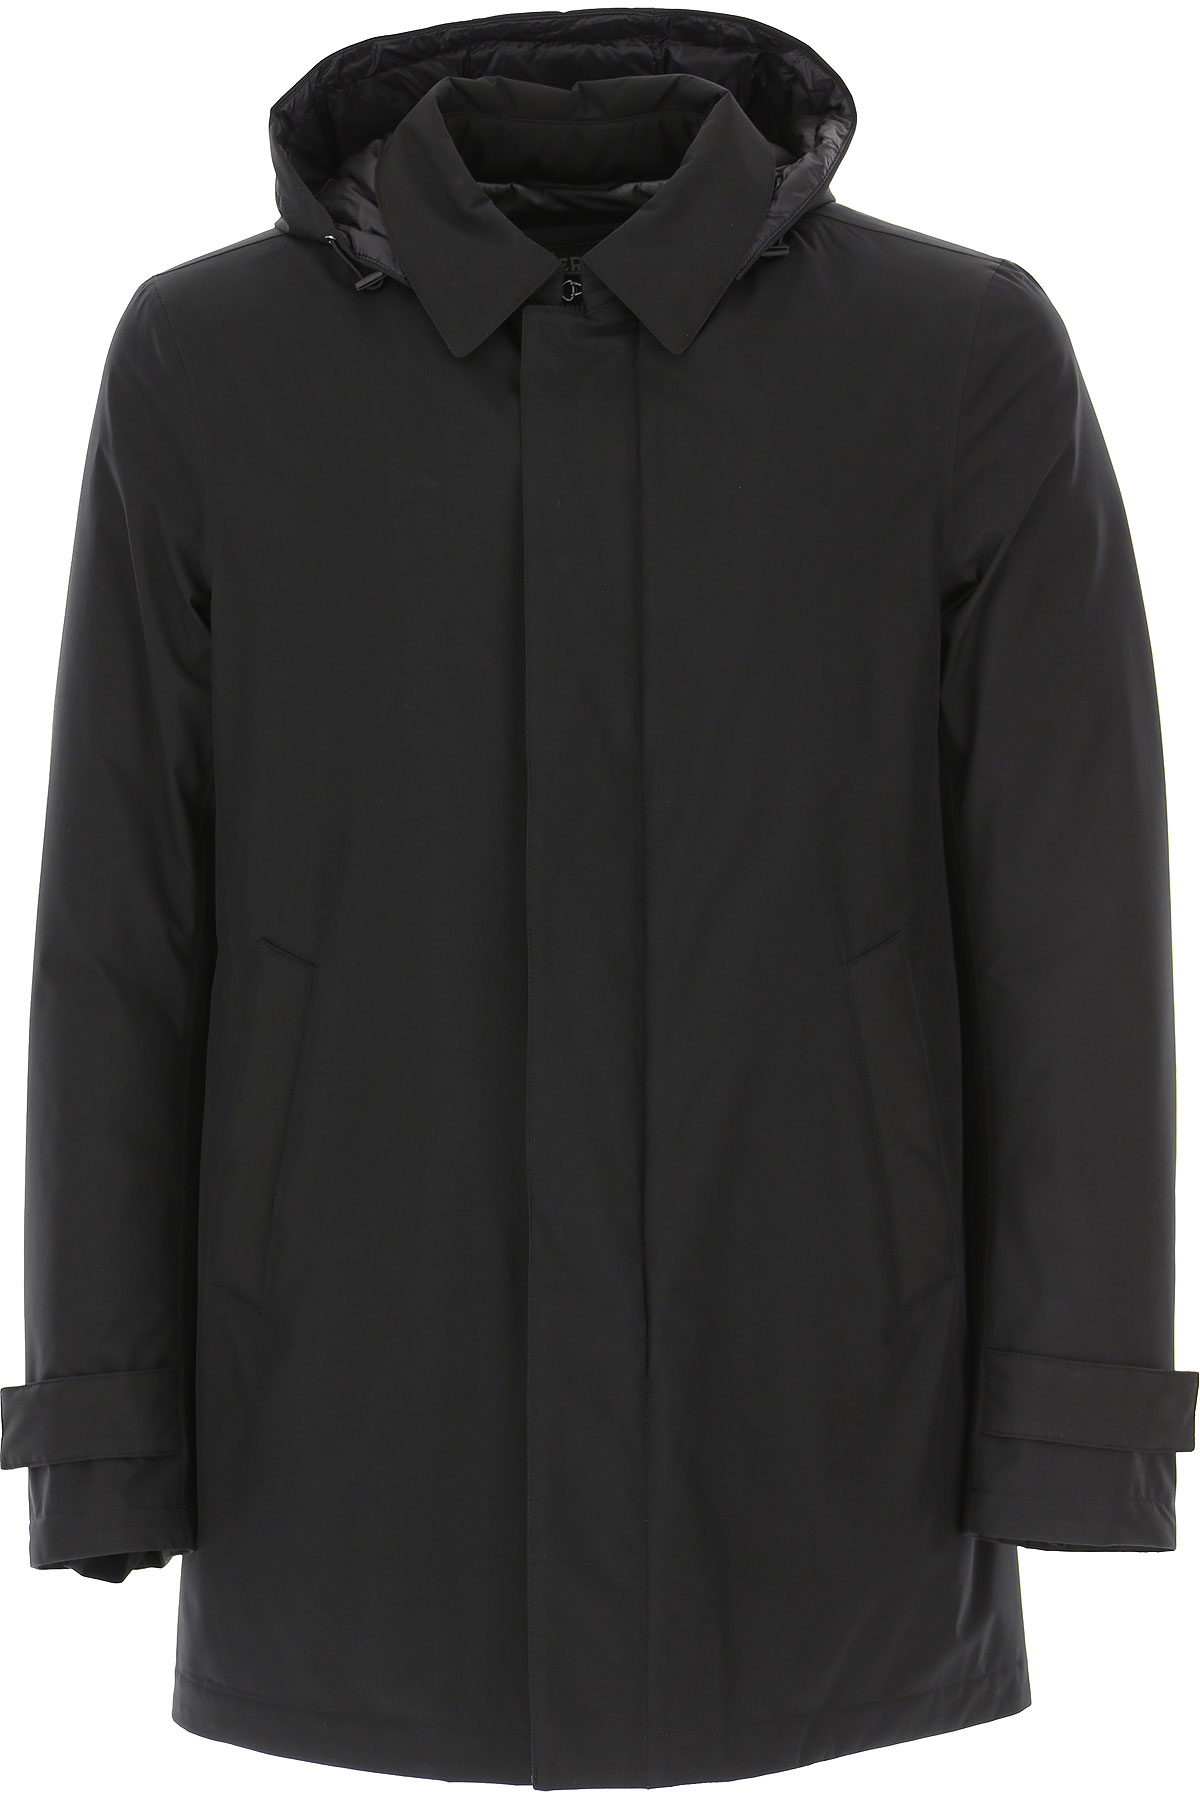 Herno Down Jacket for Men, Puffer Ski Jacket On Sale, Black, polyestere, 2019, L XL